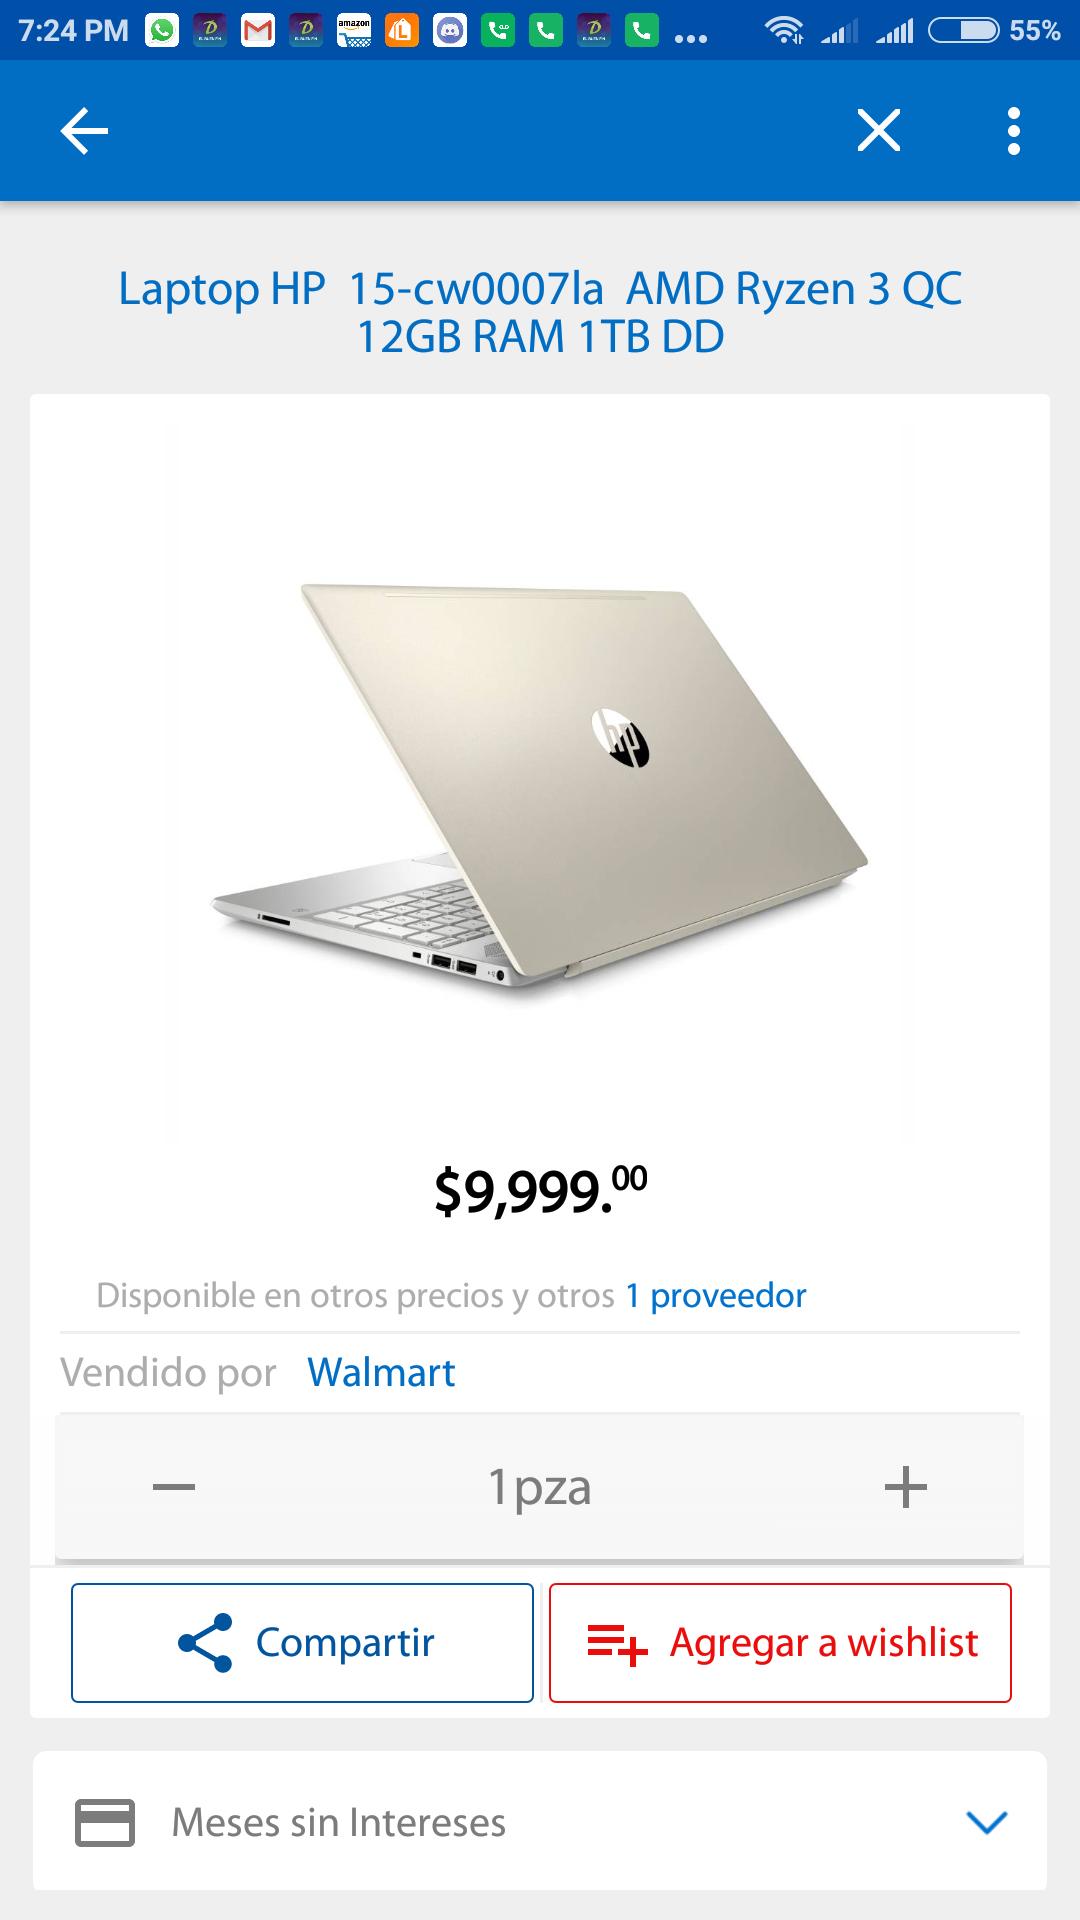 Buen Fin en Walmart: Laptop HP 15-cw0007la AMD Ryzen 3 QC 12GB RAM 1TB DD con Bancomer